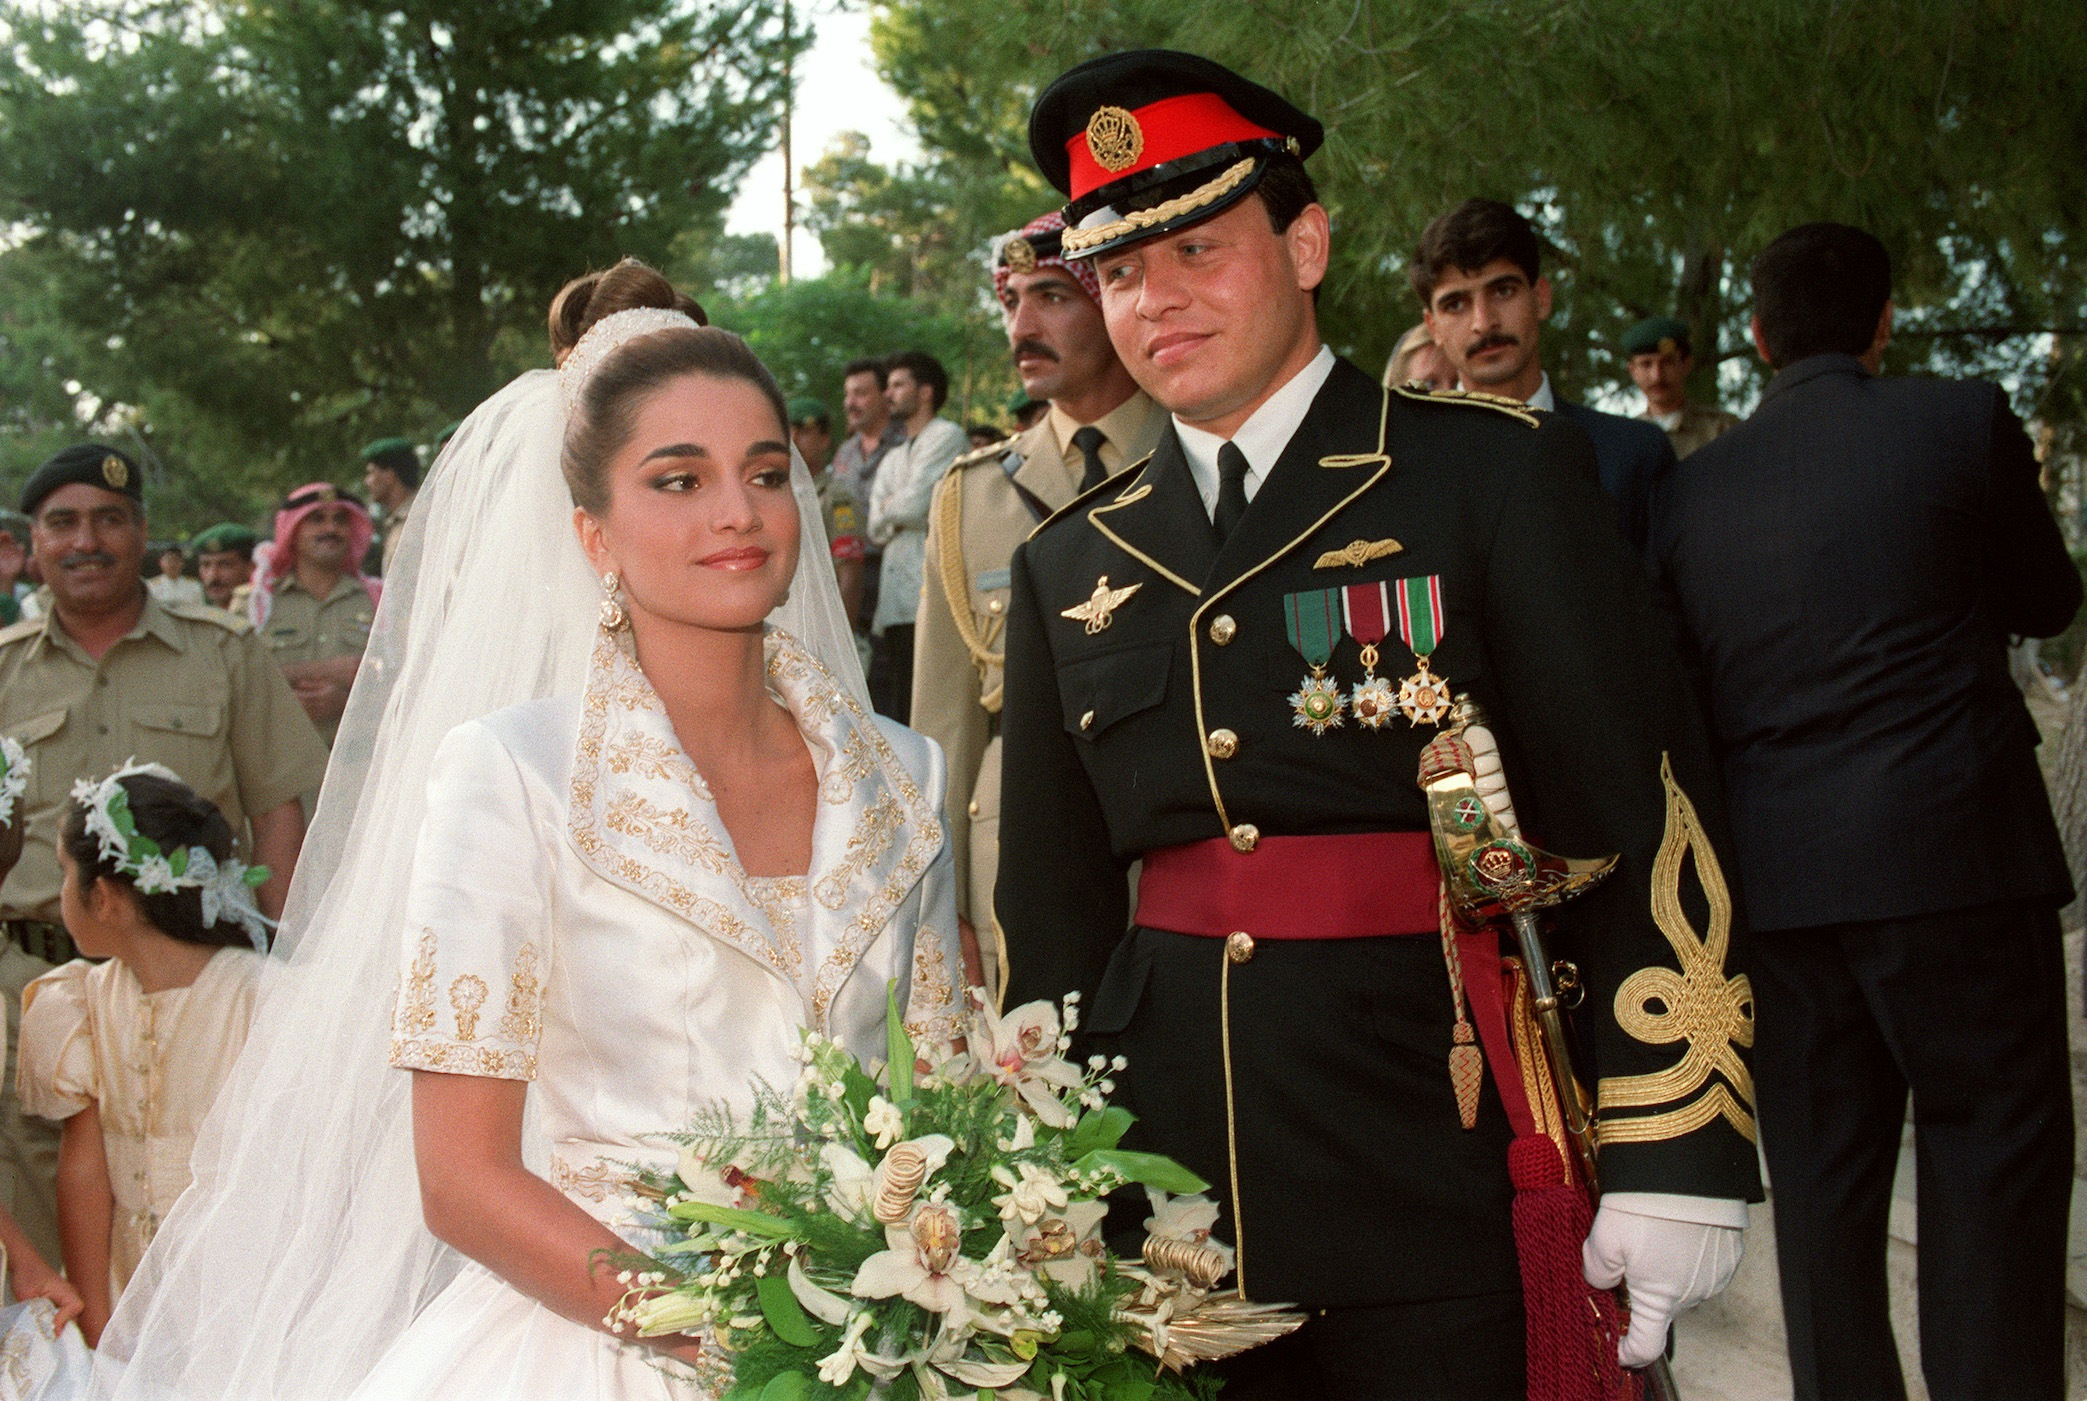 King Abdullah and Rainia wedding